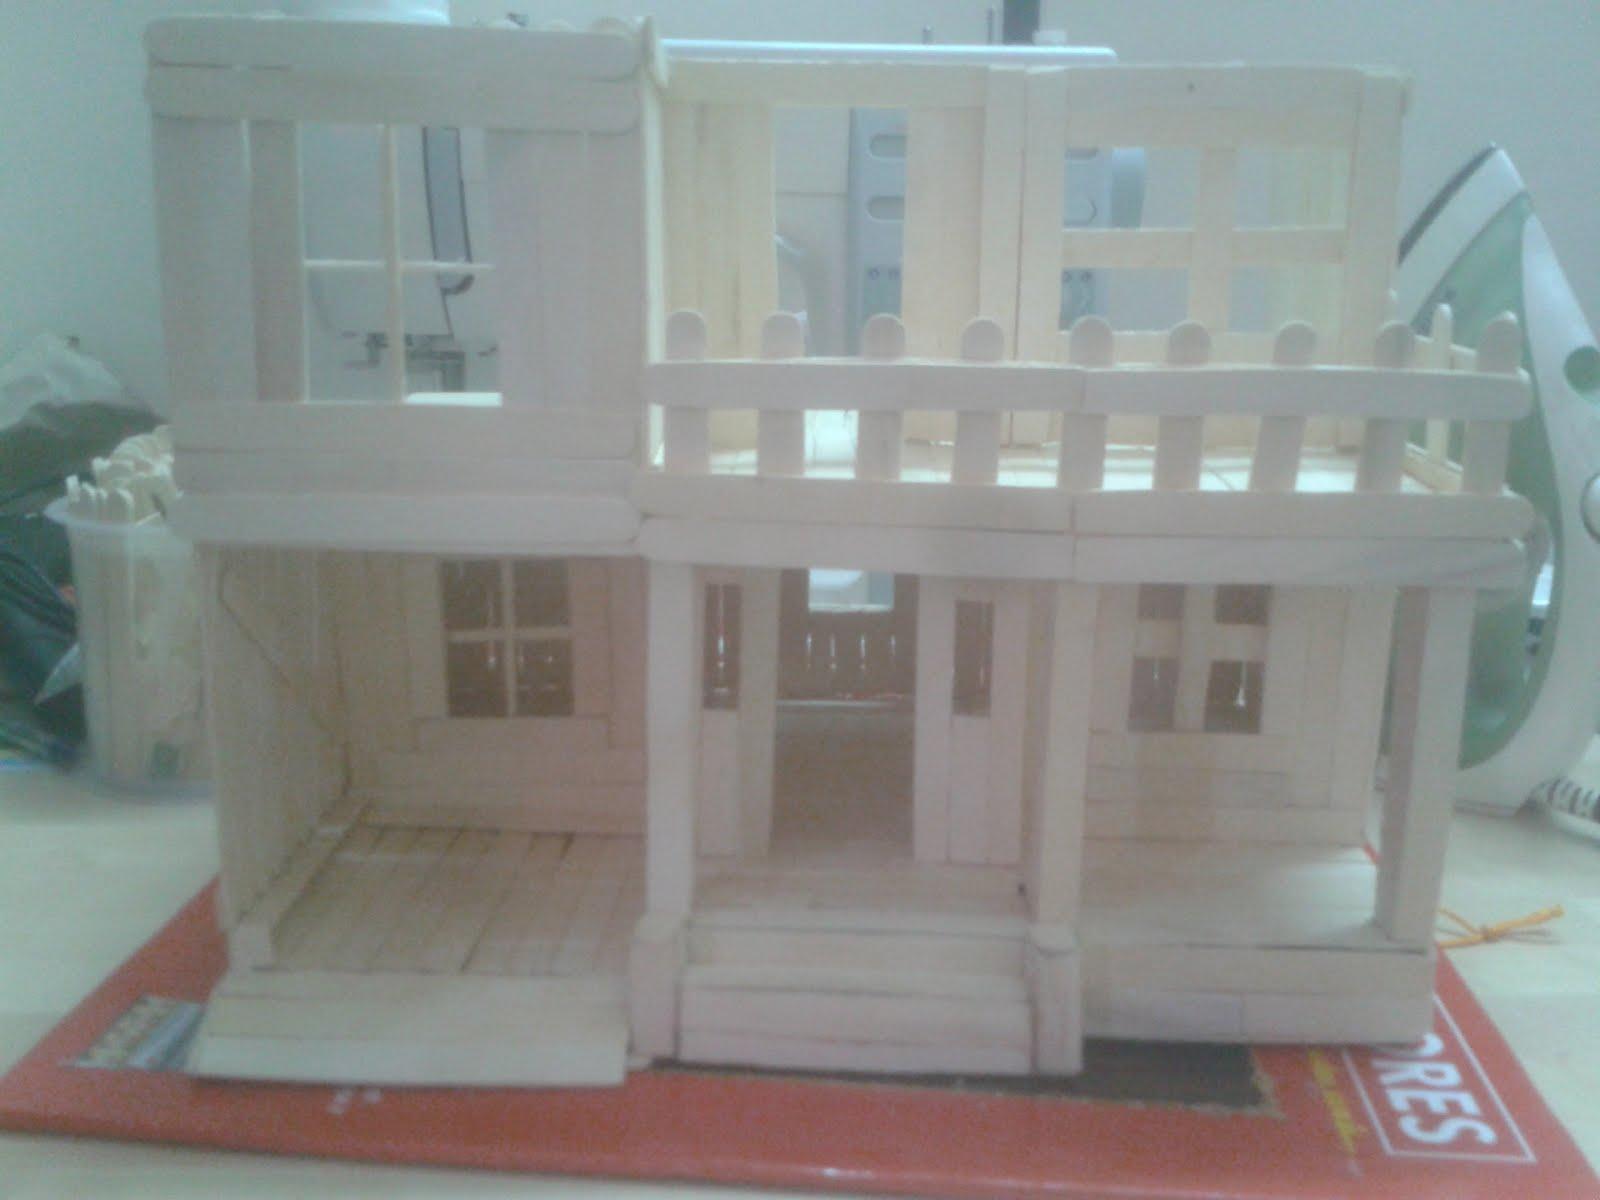 Build a cardboard house school project